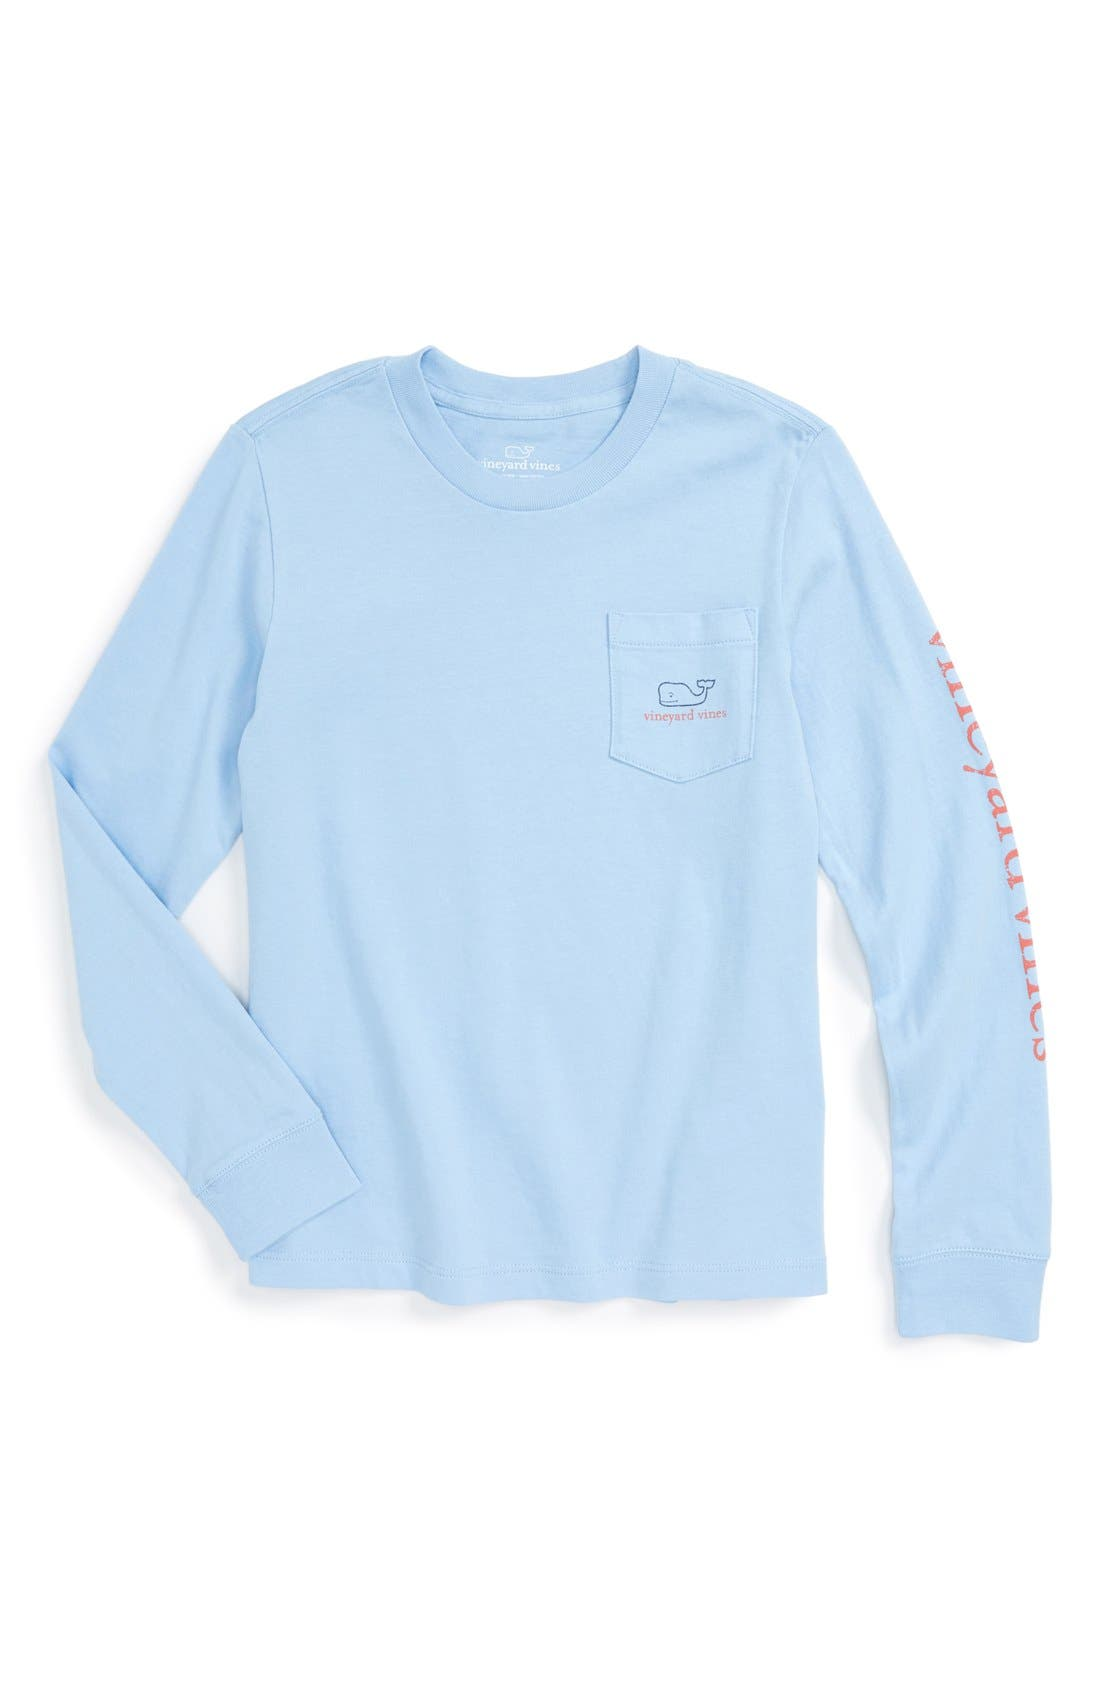 Main Image - vineyard vines Vintage Whale Long Sleeve Pocket T-Shirt (Toddler Boys, Little Boys & Big Boys)